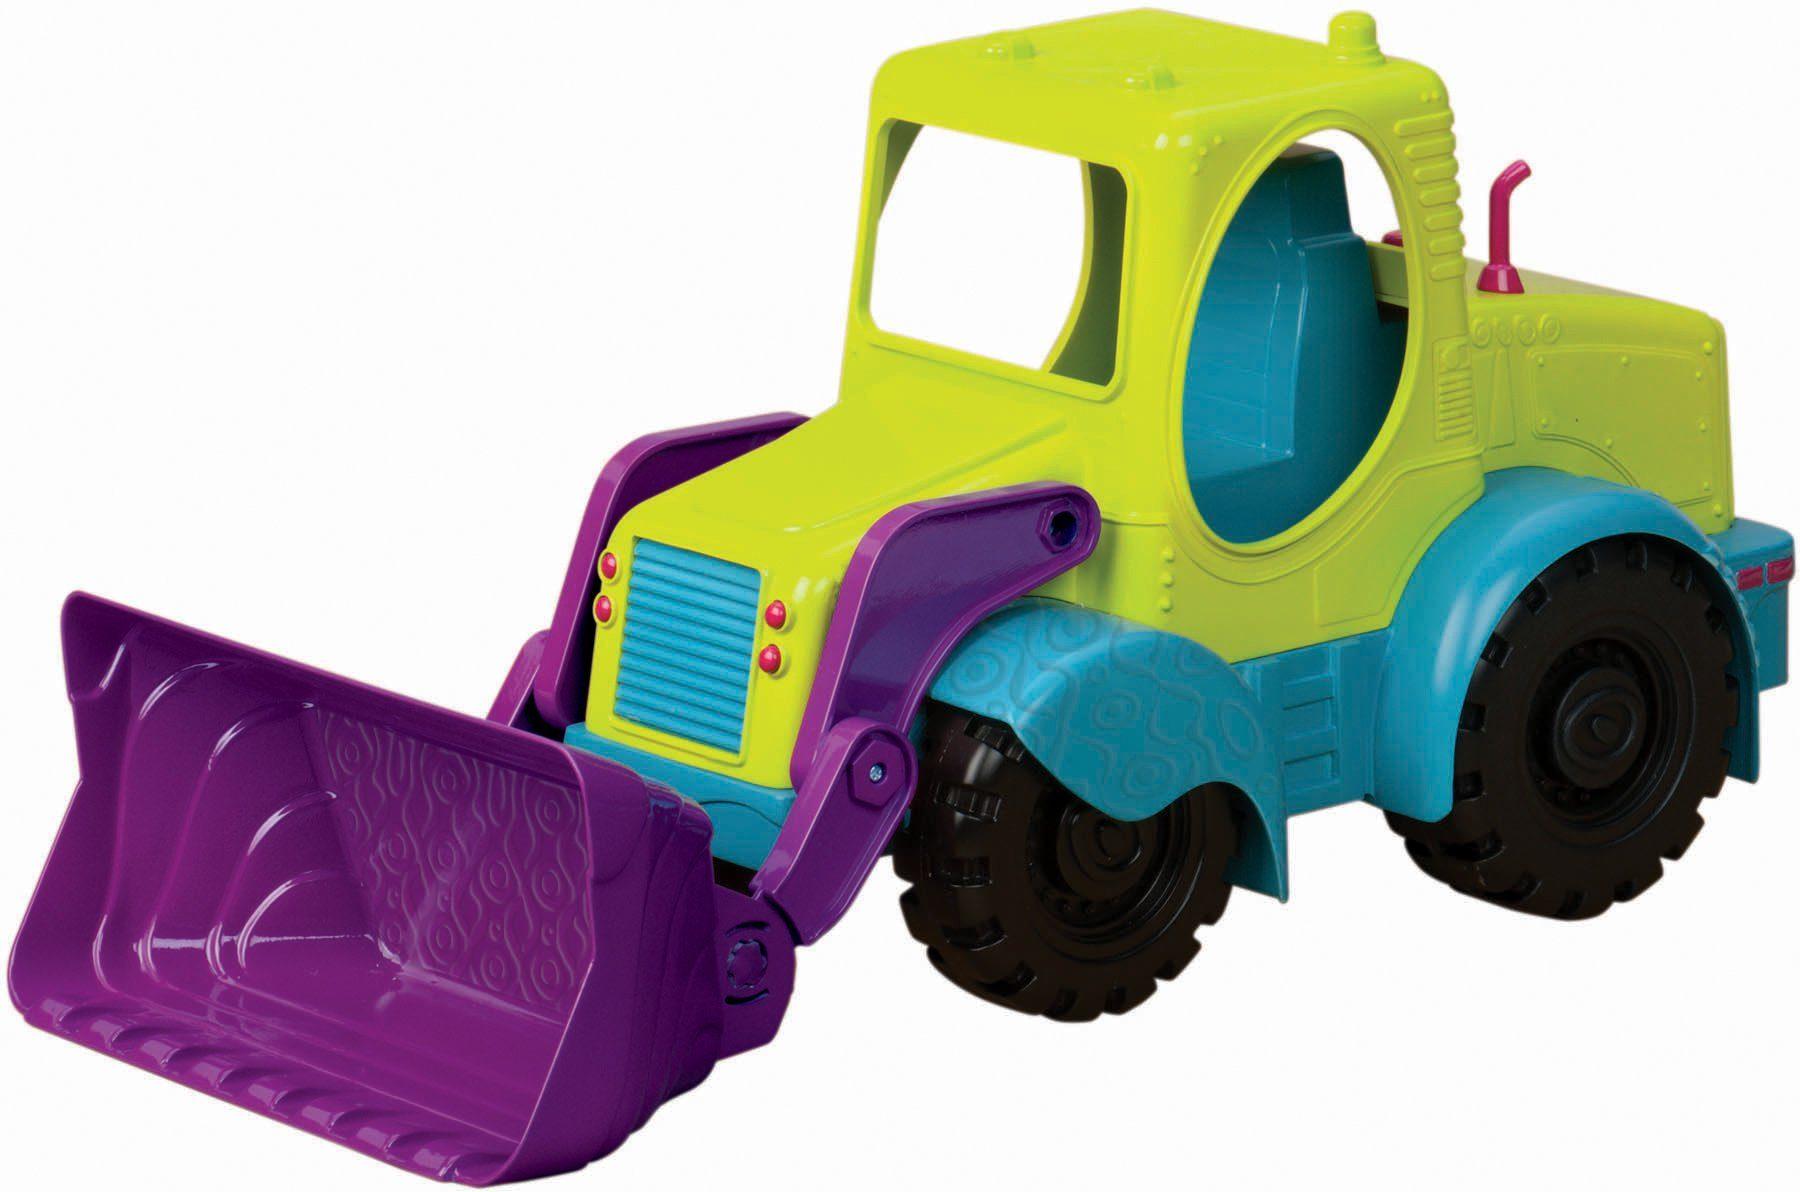 B.toys Spielzeugtraktor, »Excavator Truck«